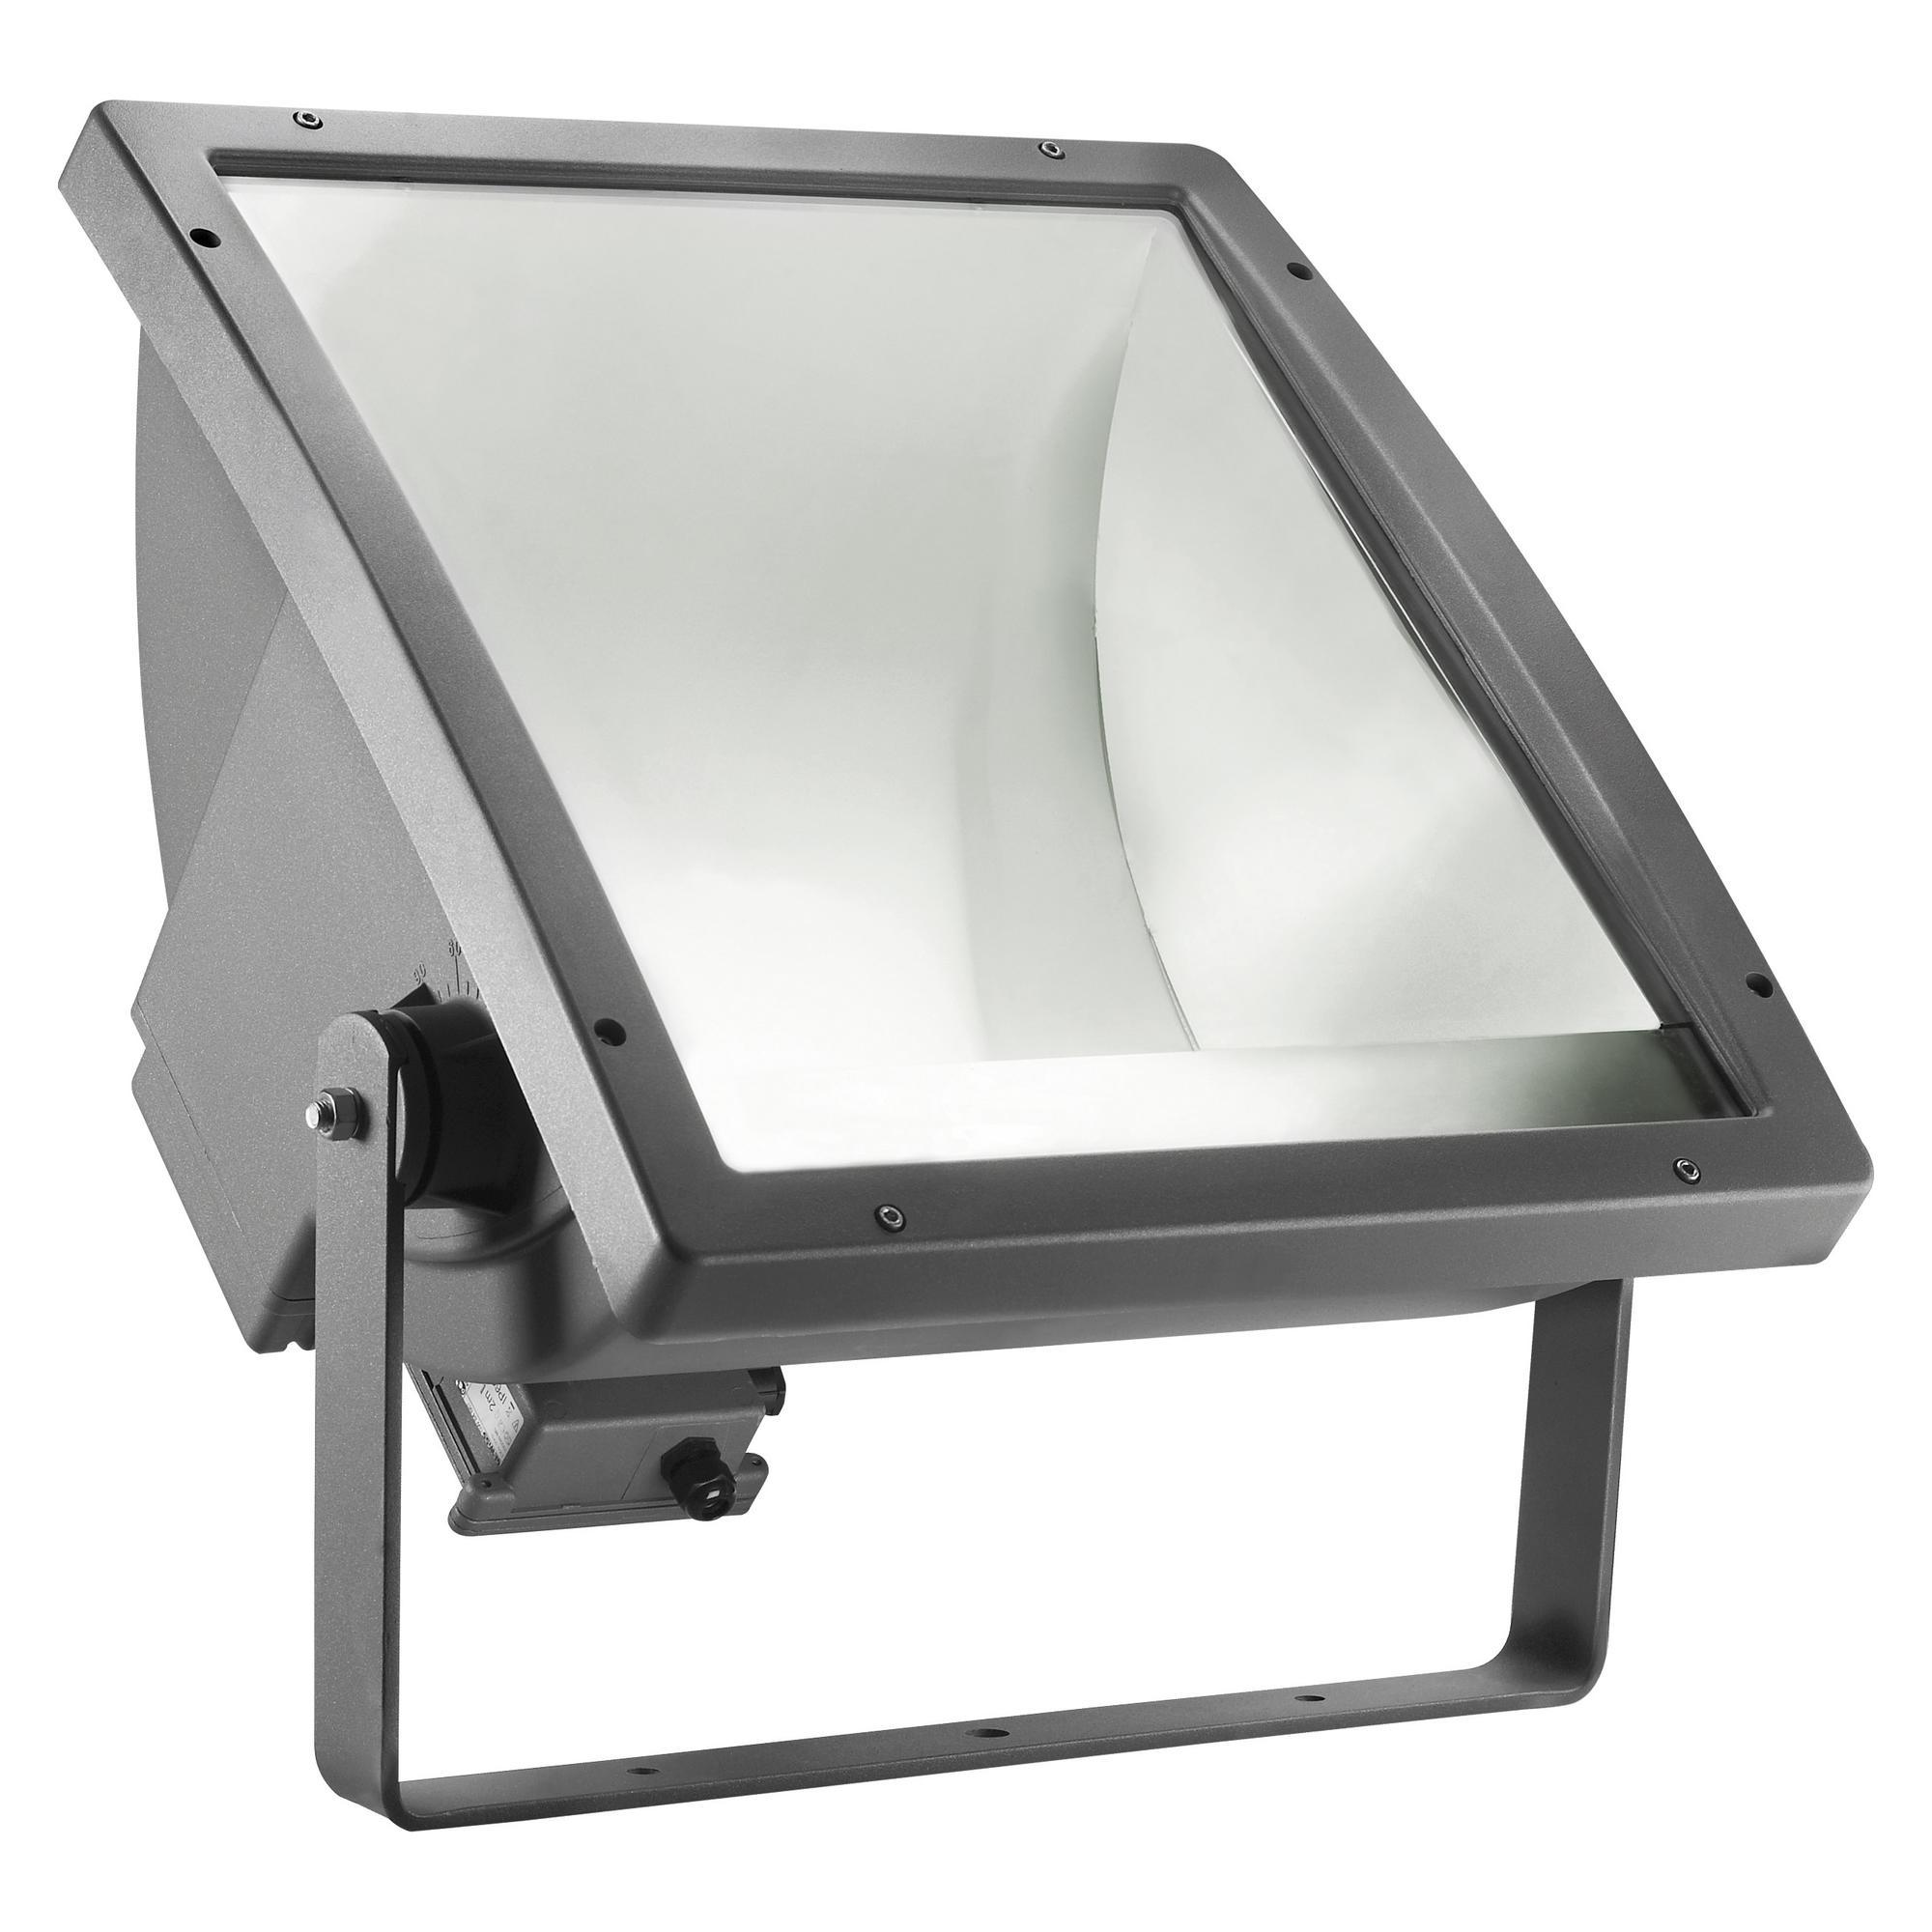 Stadium Lighting Equipment: Floodlight - GW84668